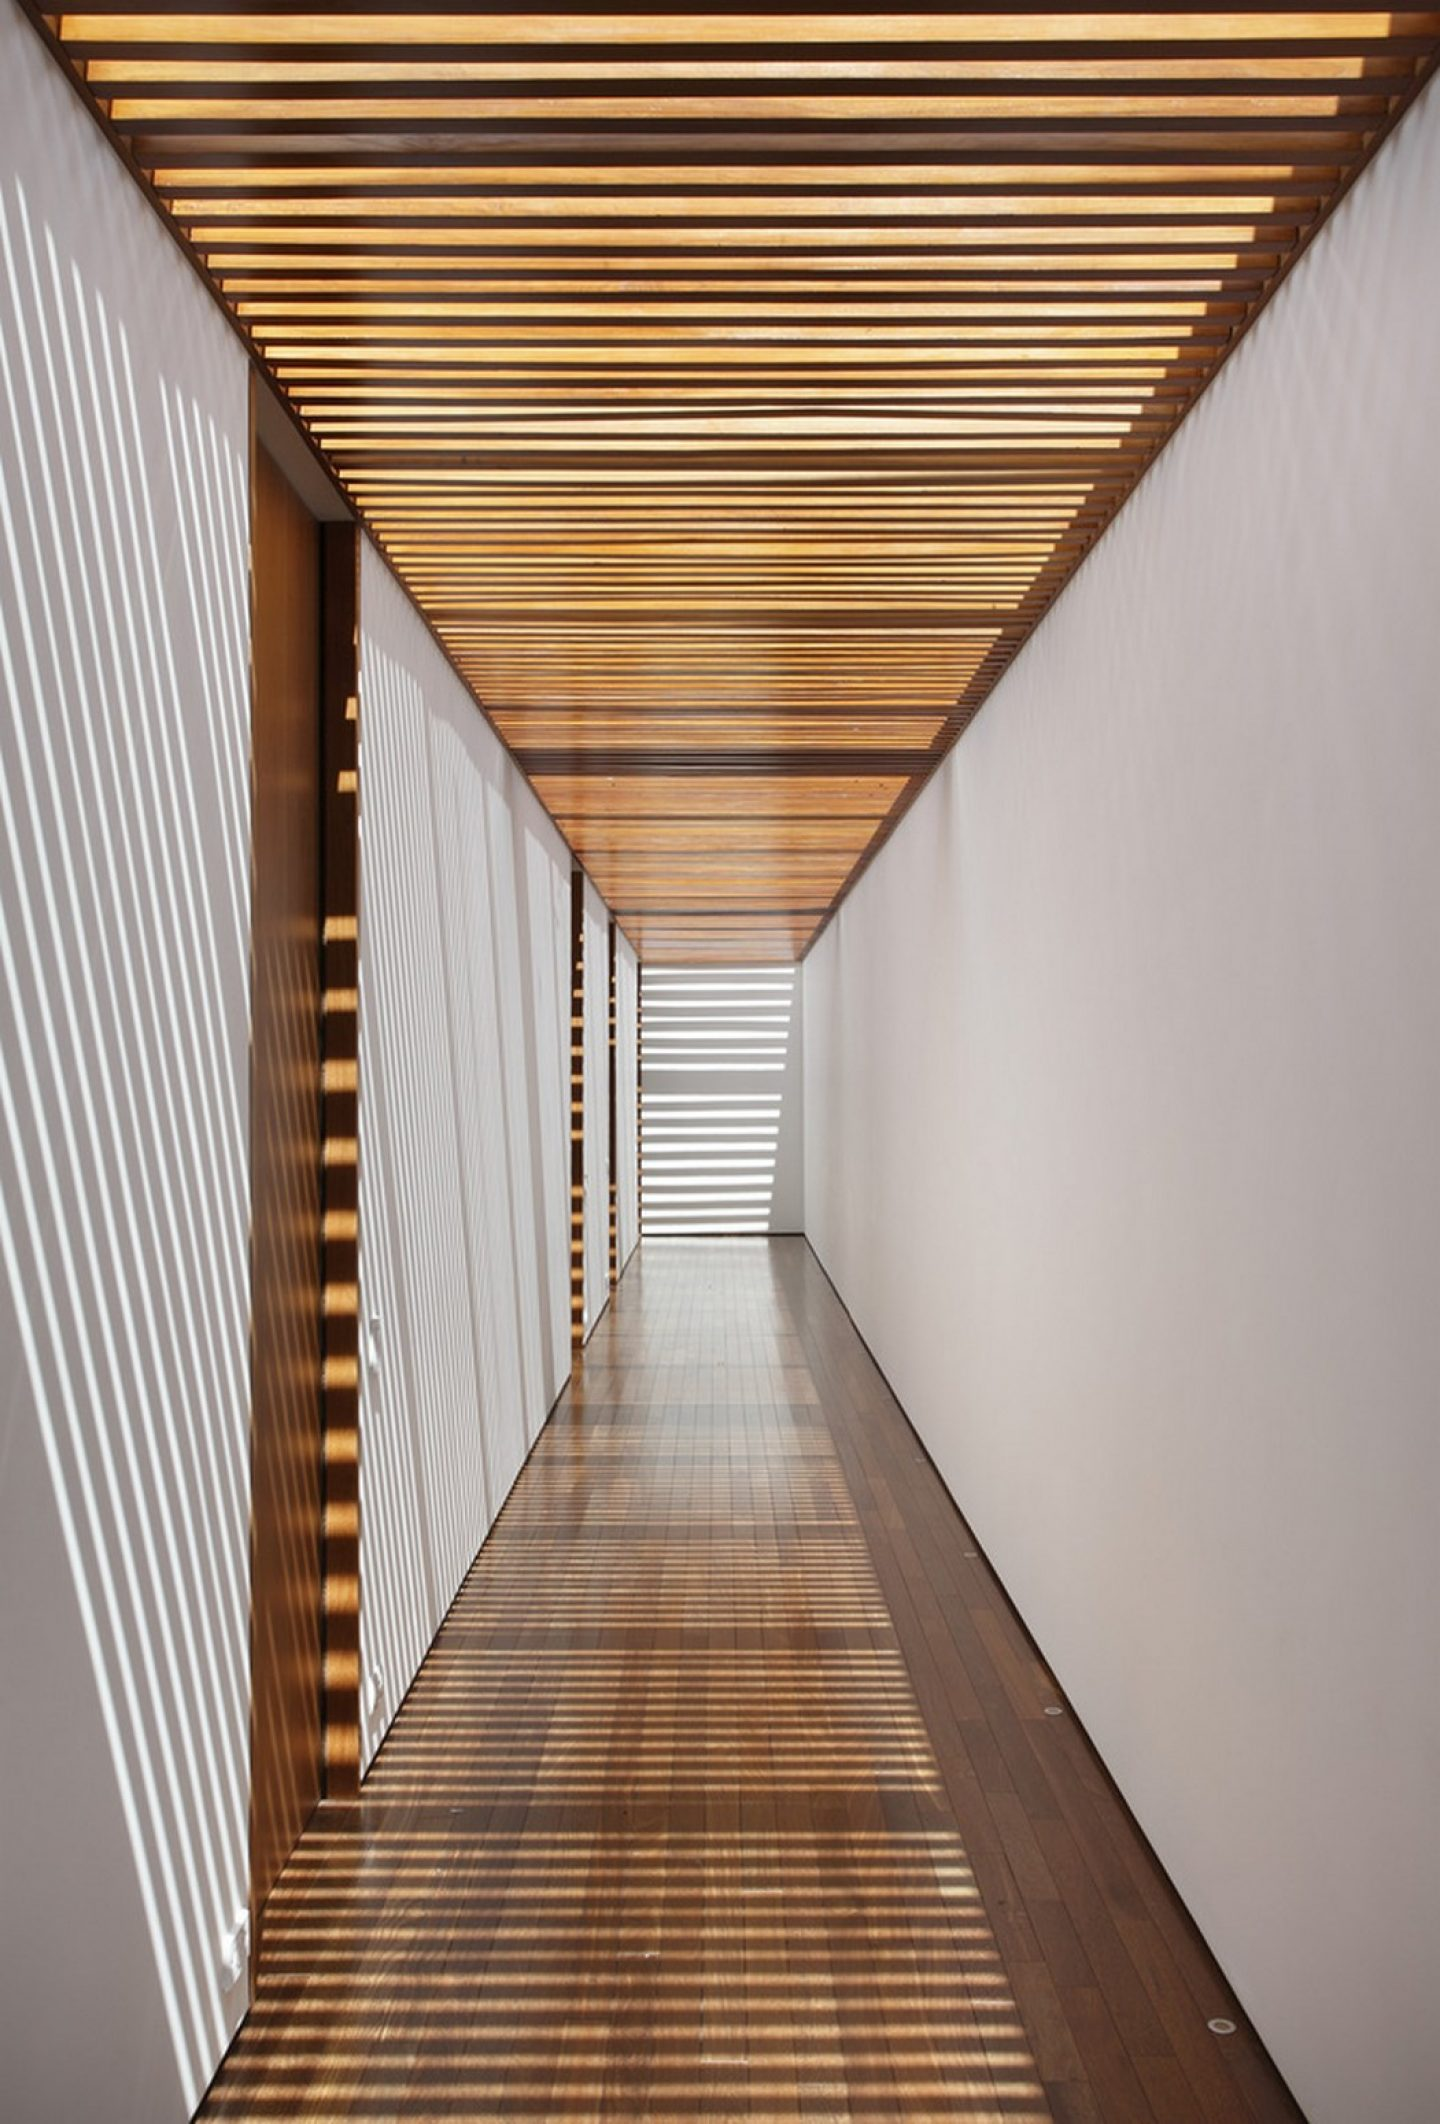 Guilherme_Torres_Architecture (7)